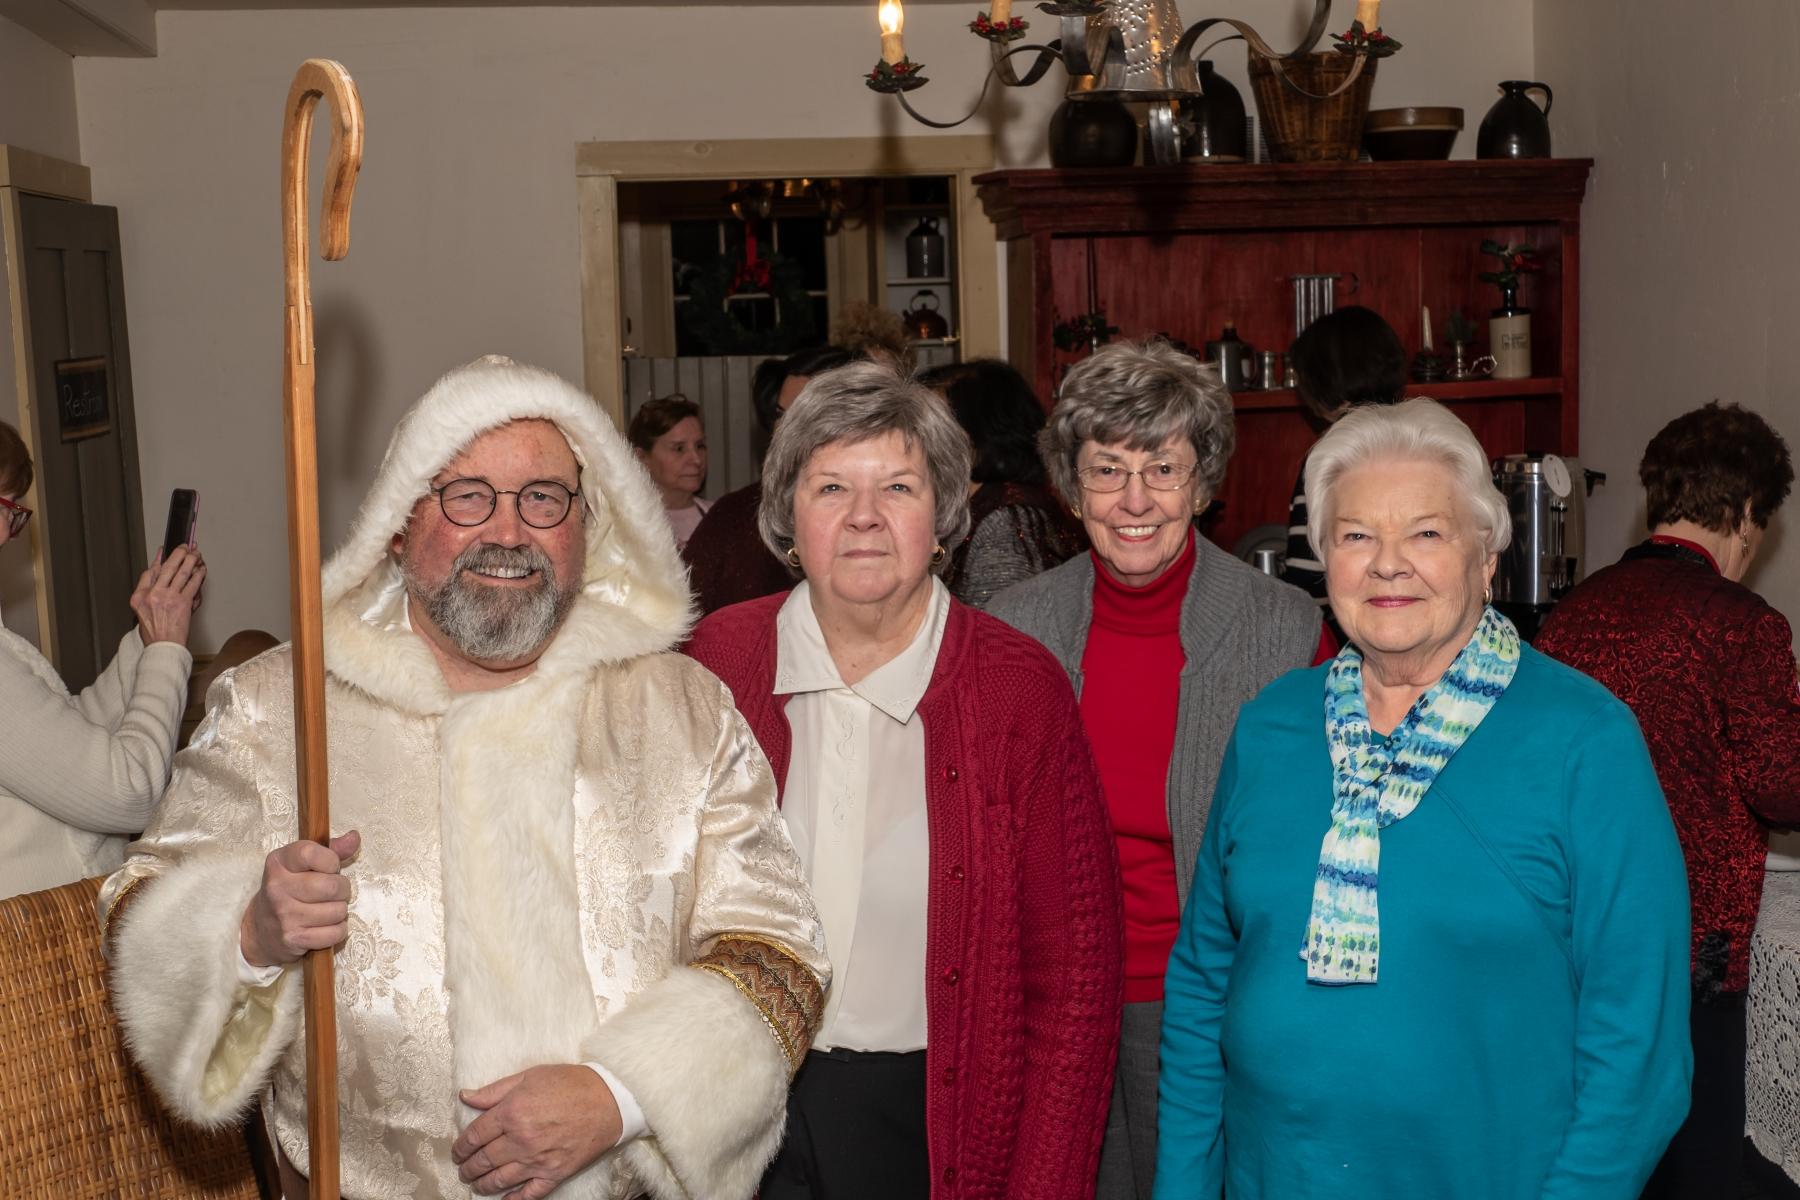 Robert Sochacki, Joan Cotton, Barb Wilson, Karen Olson.